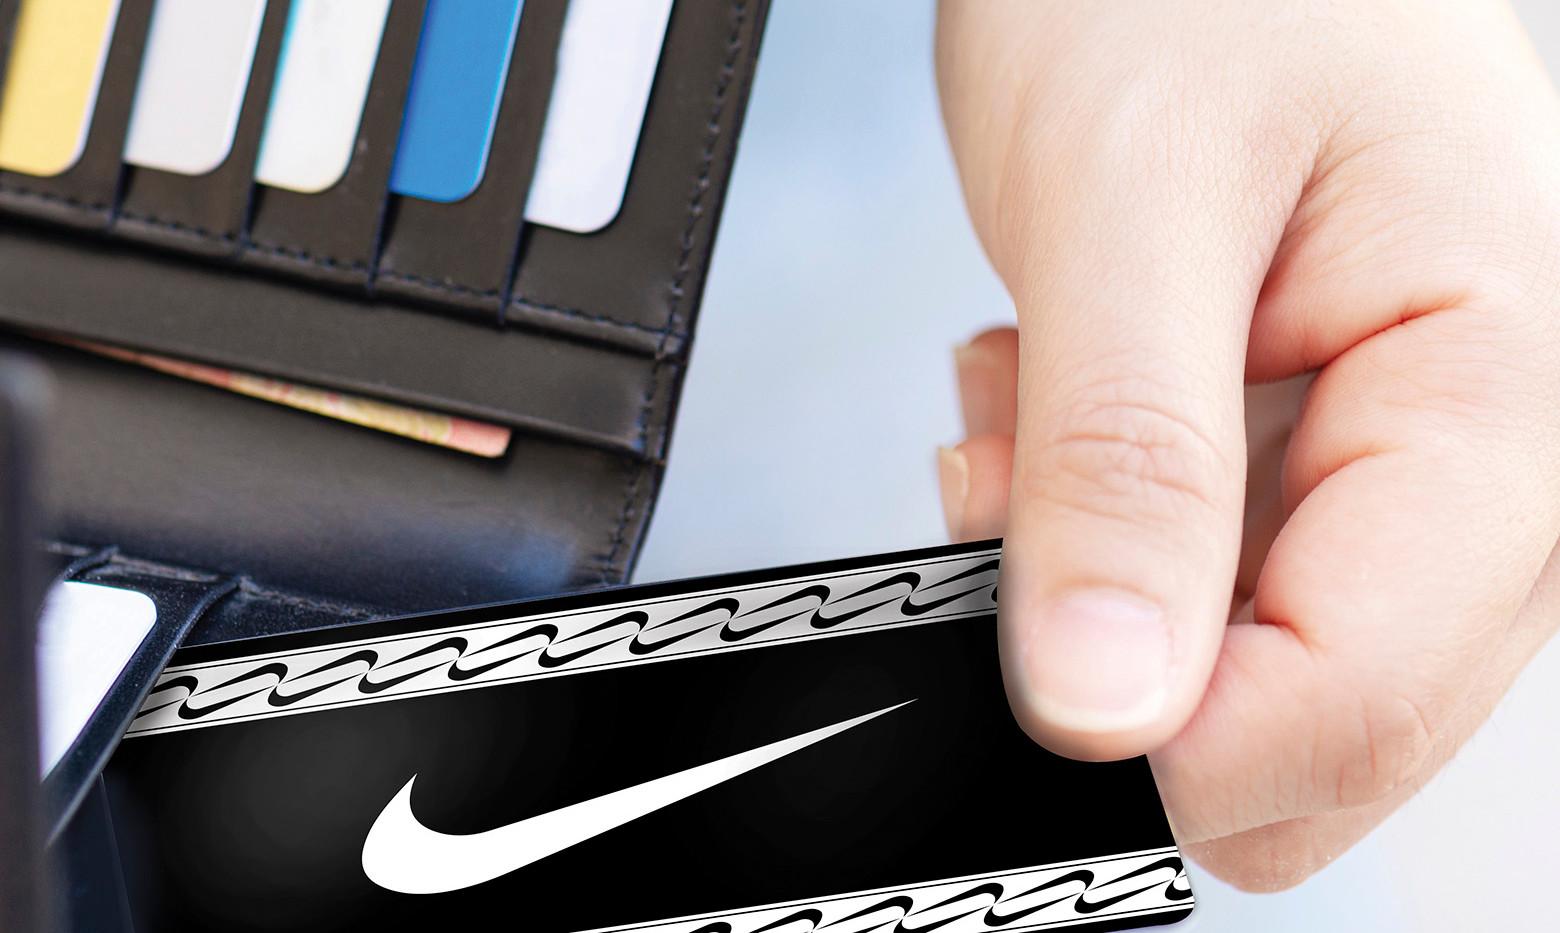 rfidcard-lifestyle Nike.jpg